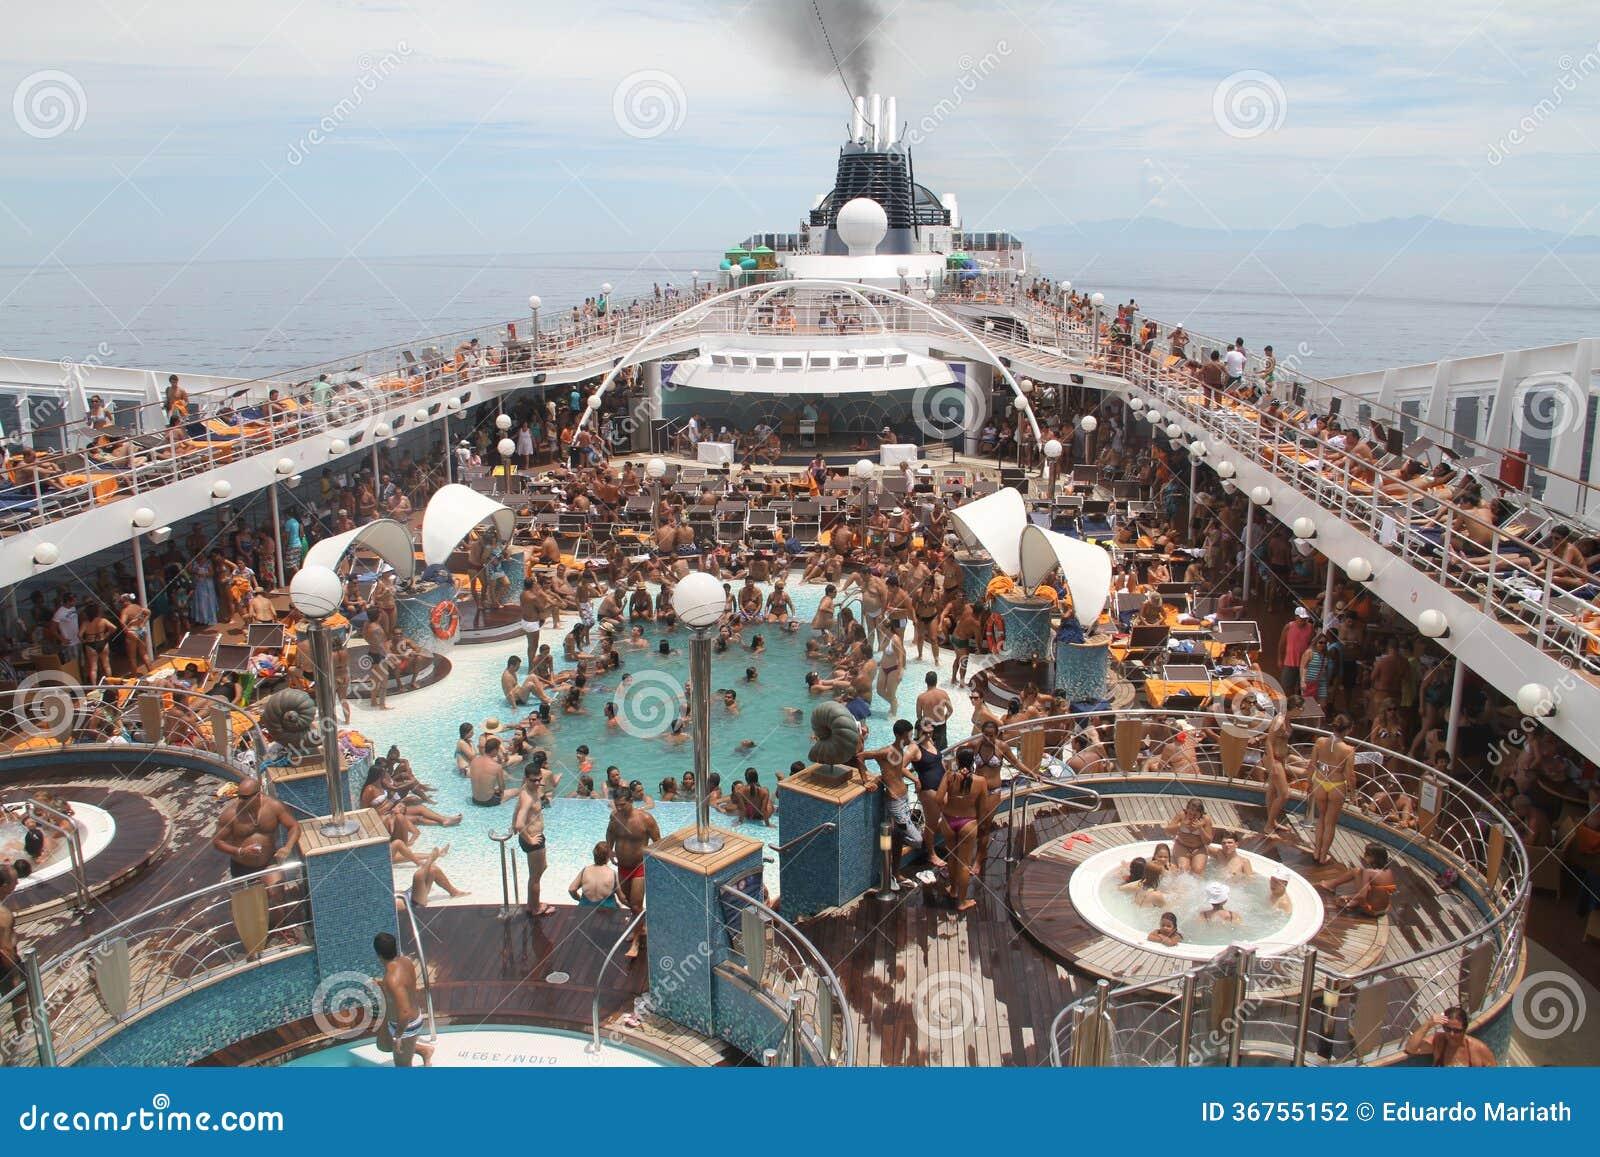 Cruise Ship Crowd - Brazilian coastline